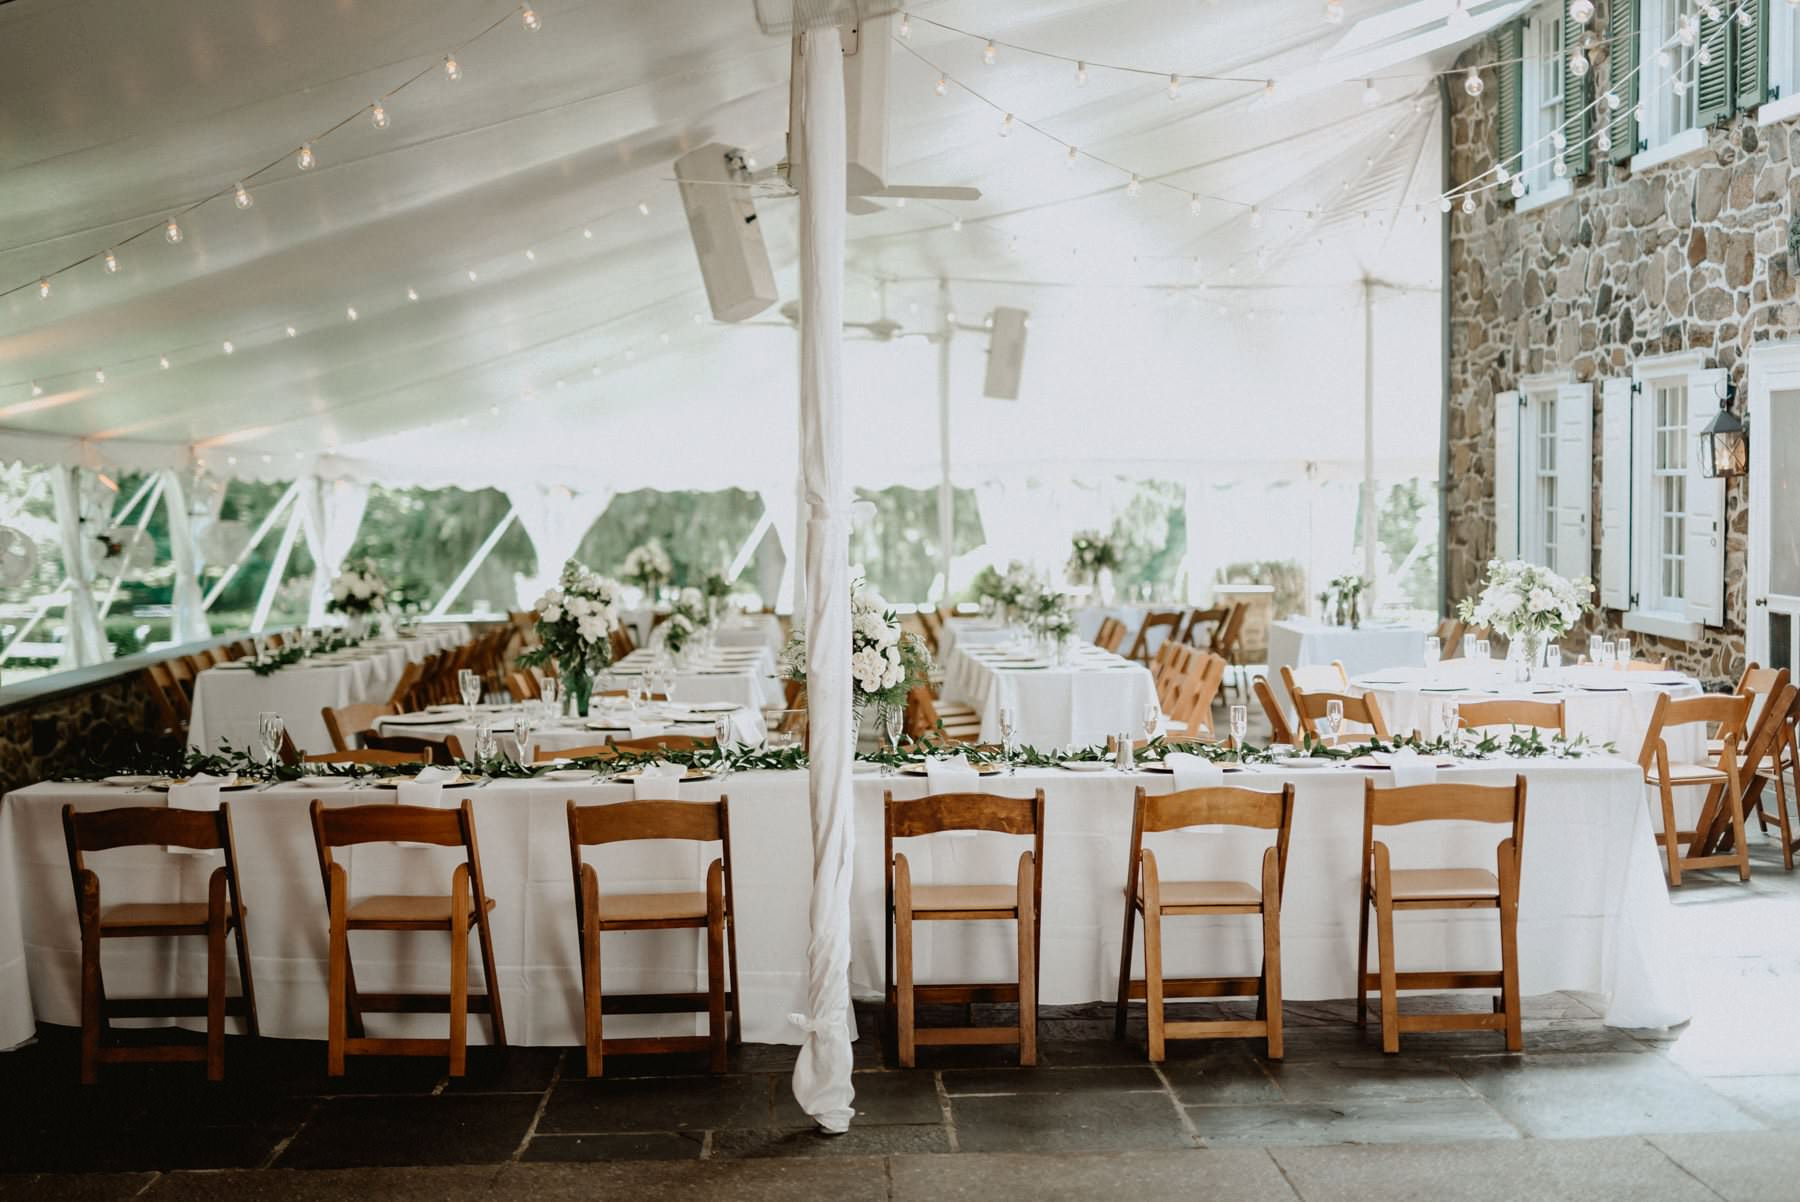 Appleford-estate-wedding-78.jpg